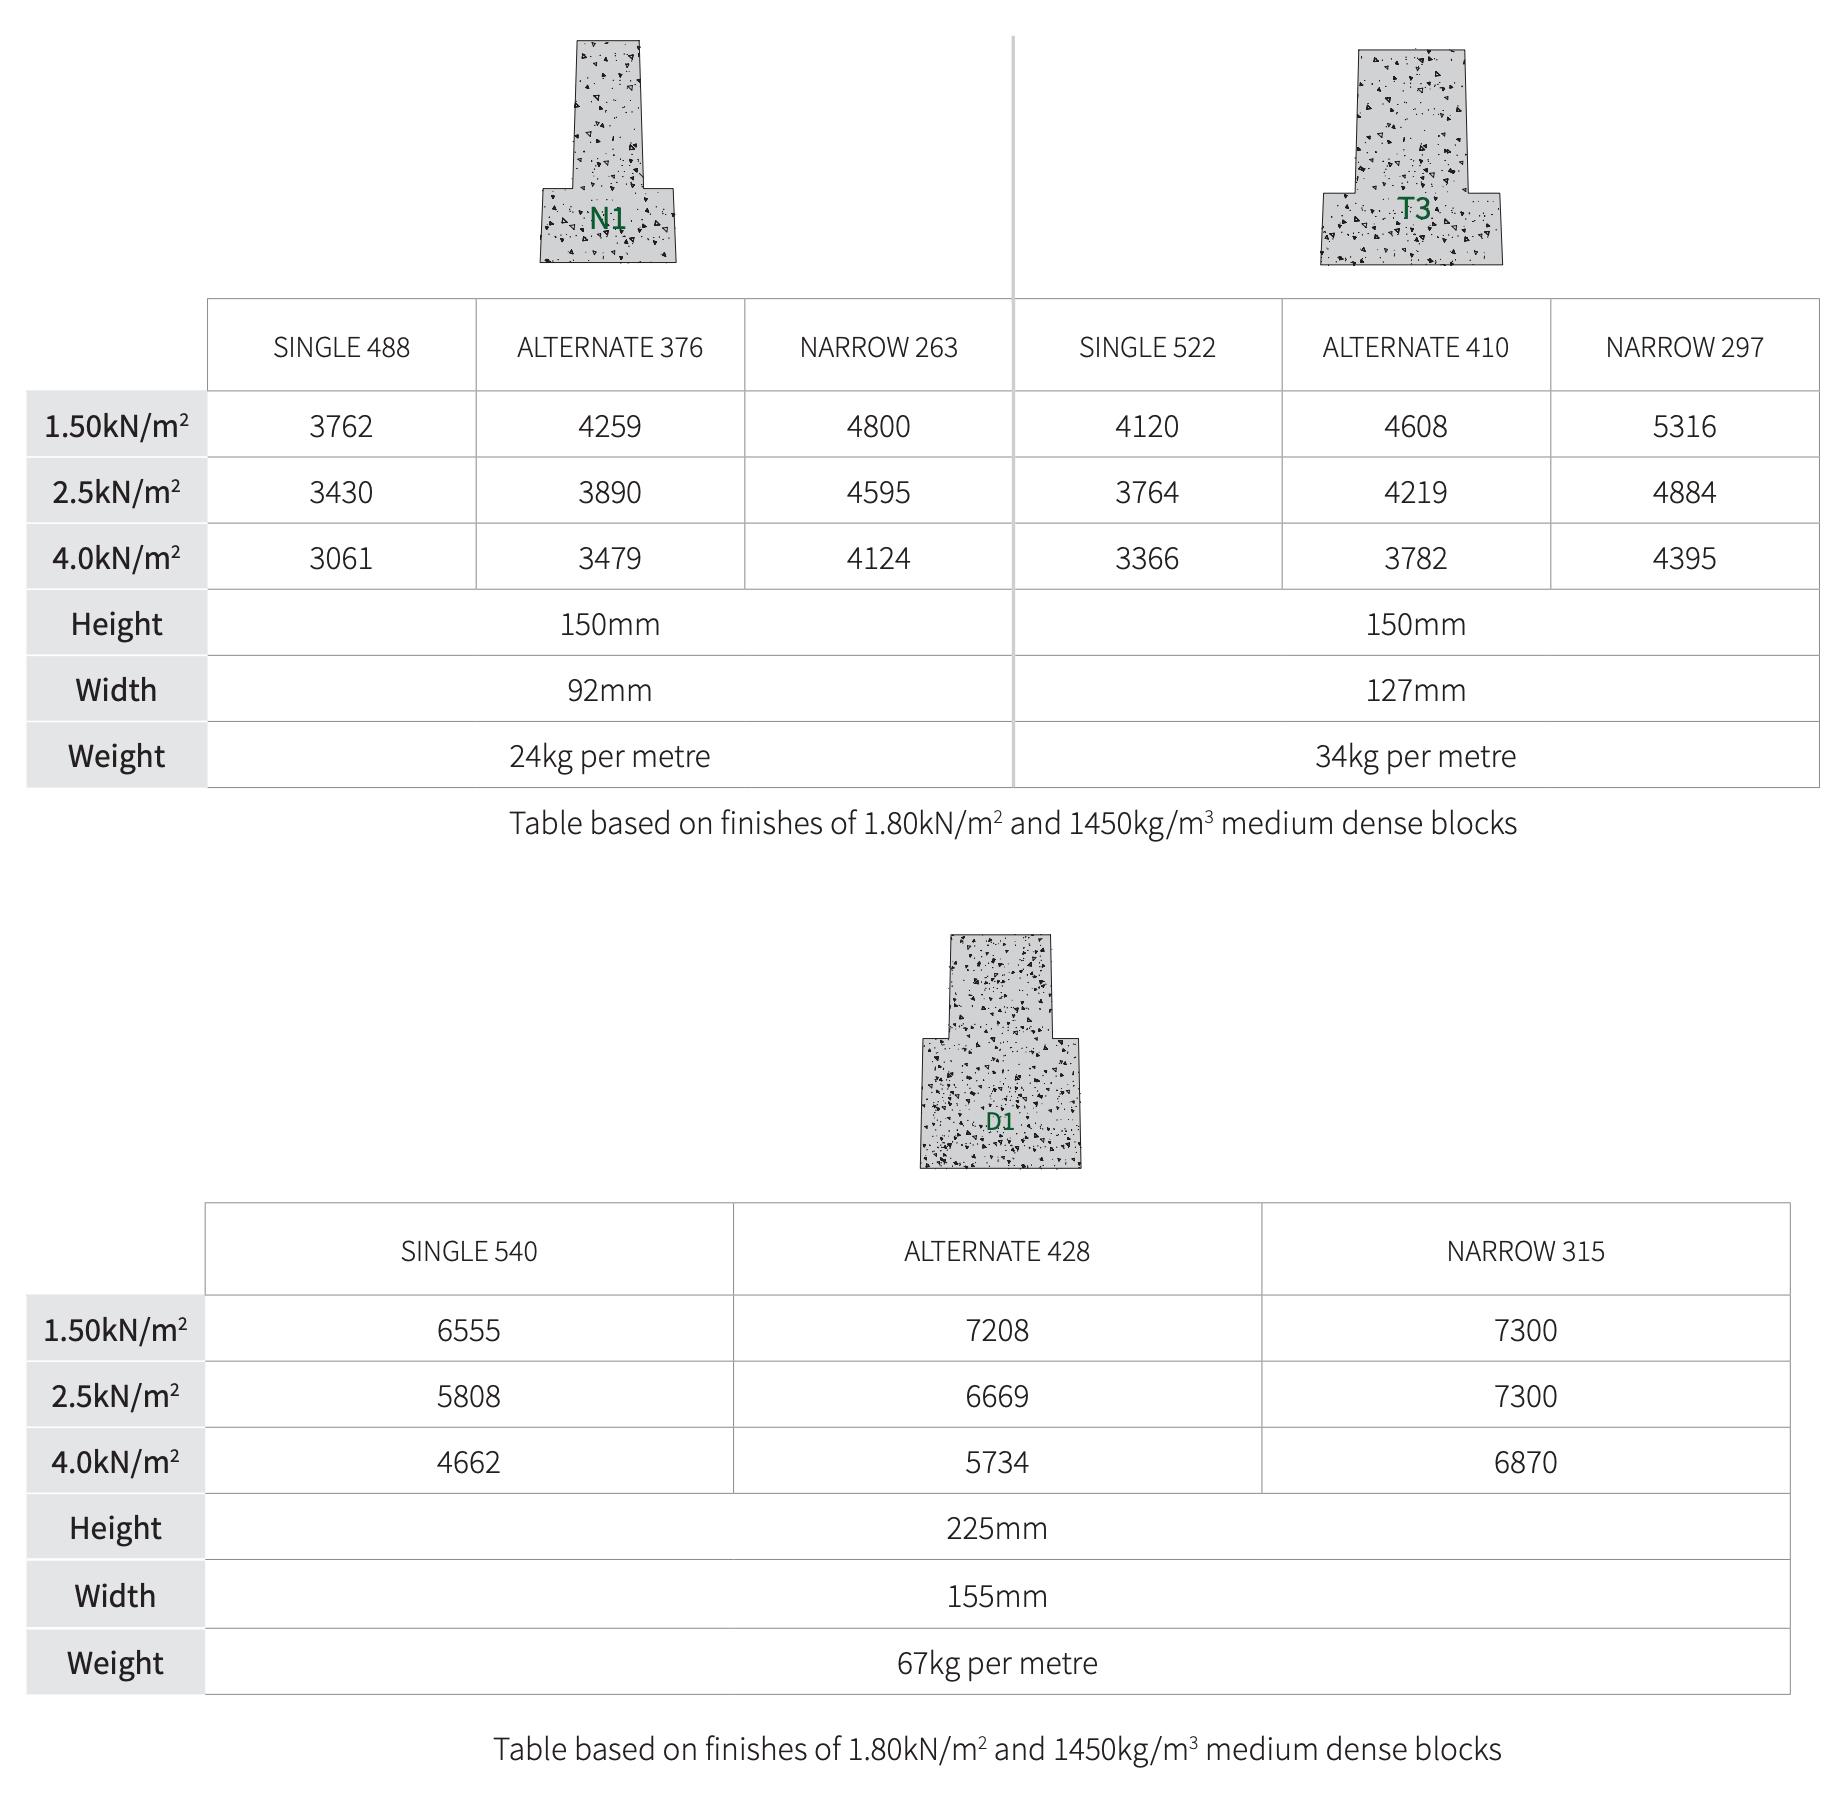 Beams comparison table